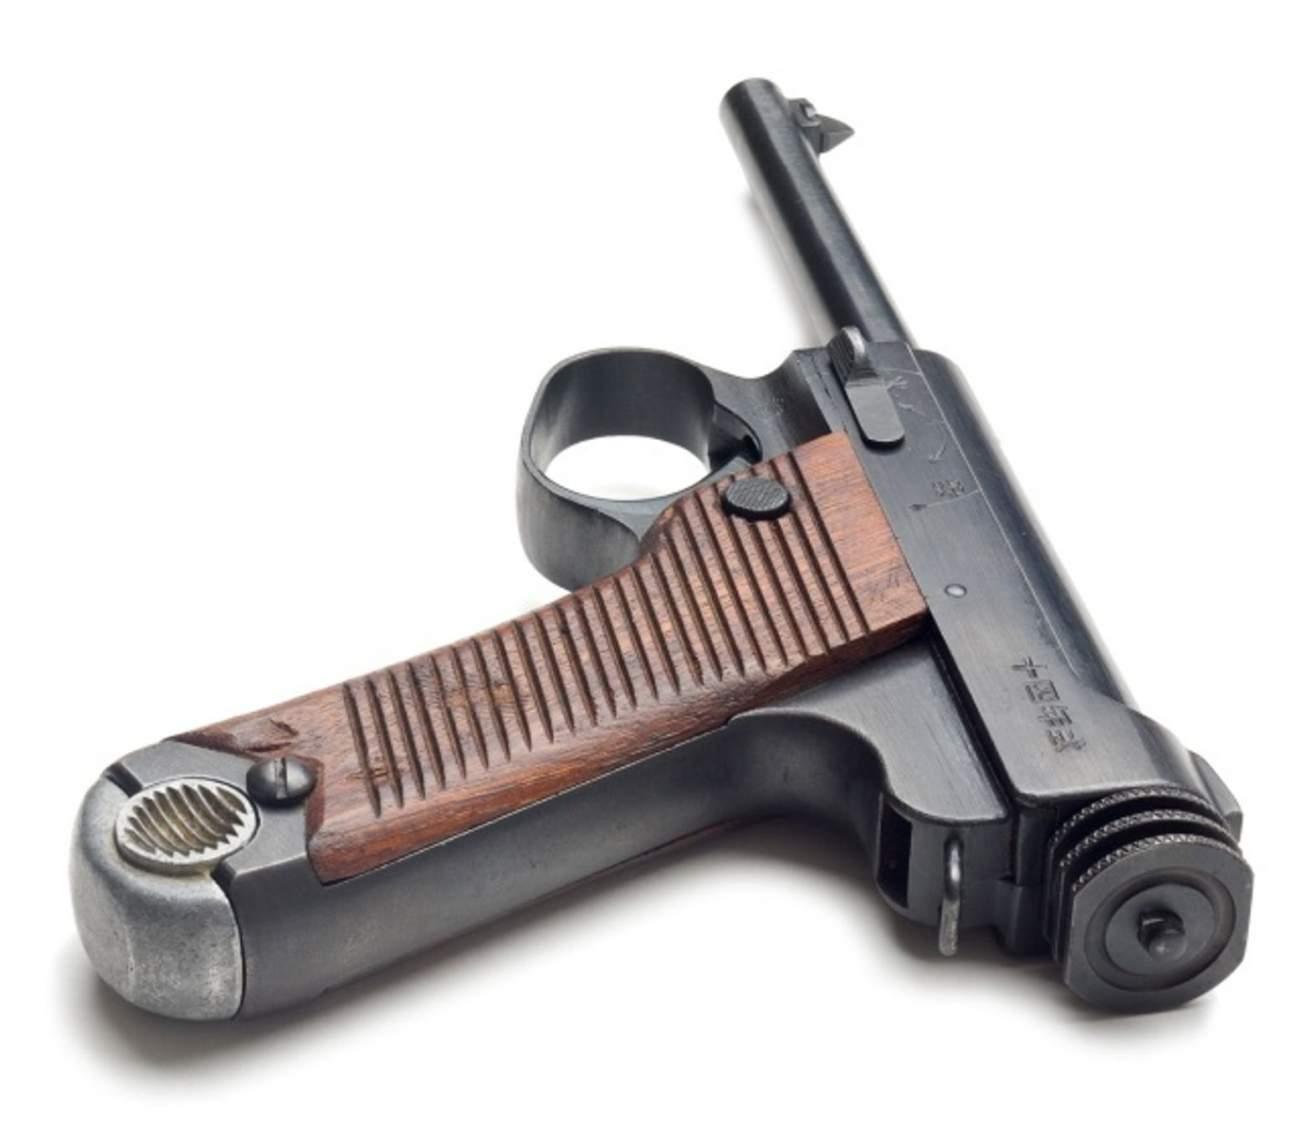 The Worst: Meet 5 Guns That Don't Belong on Any Range